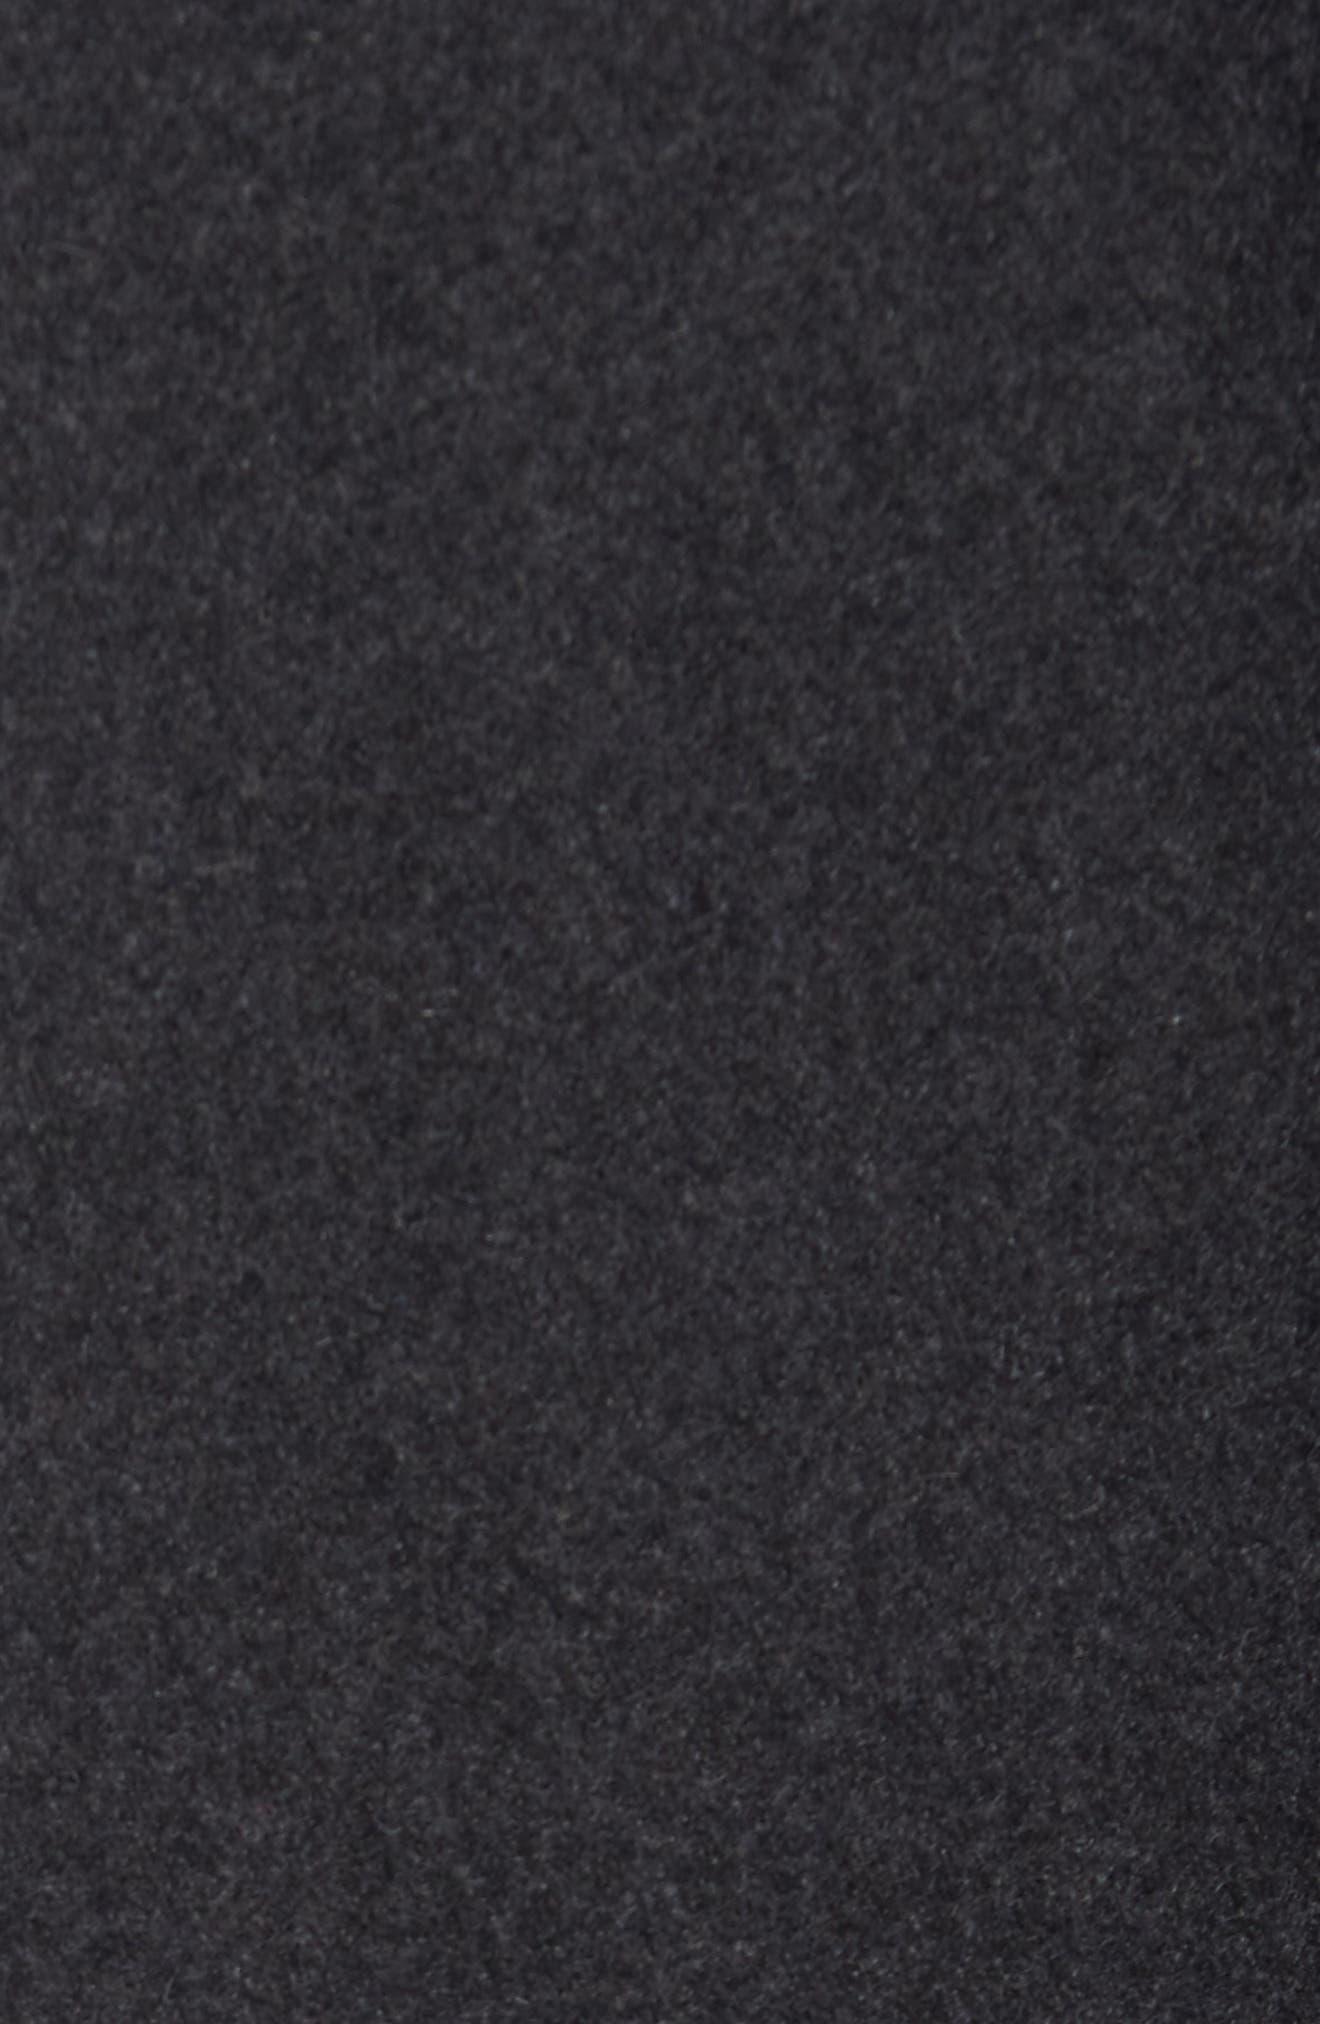 Alternate Image 4  - Cole Haan Melton Wool Blend Coat